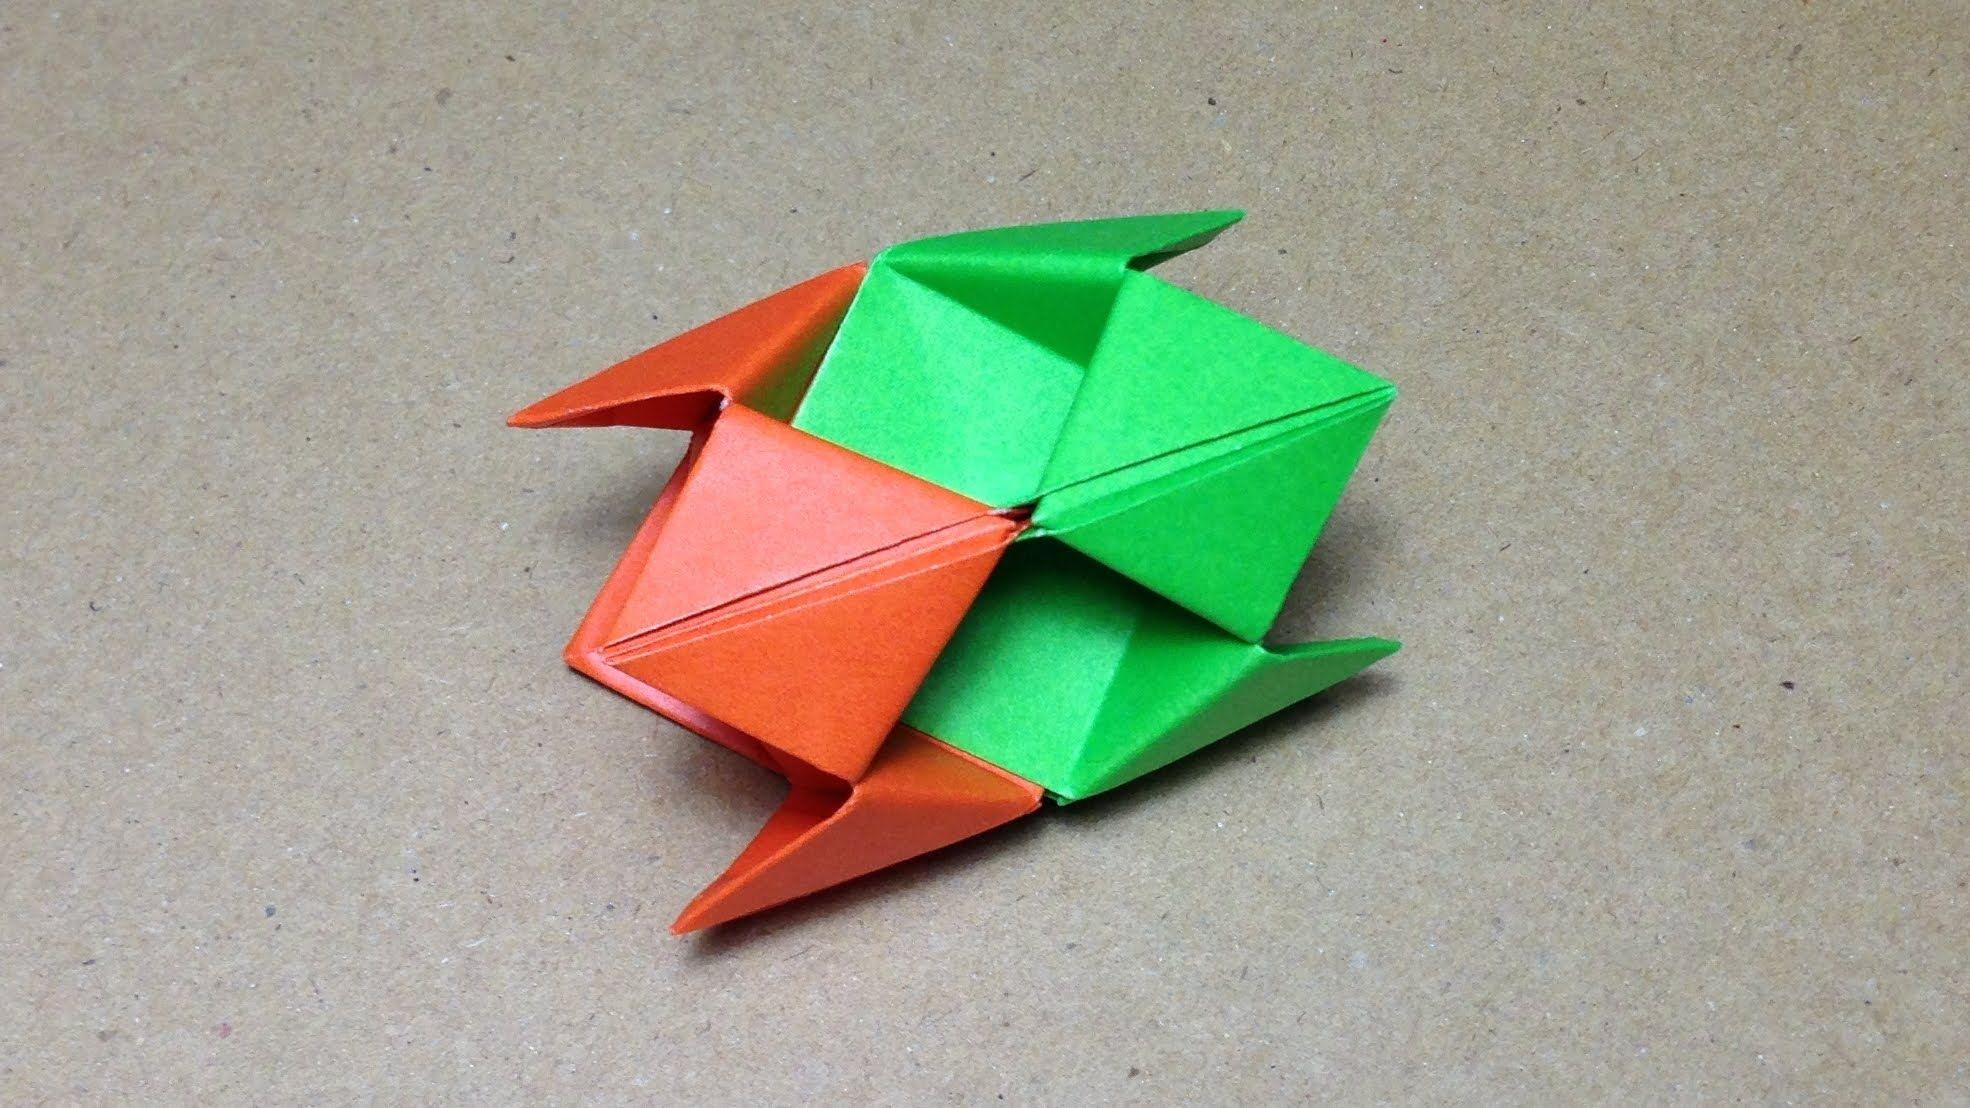 Modular Origami / How to make an Origami Ball | origami ... - photo#47